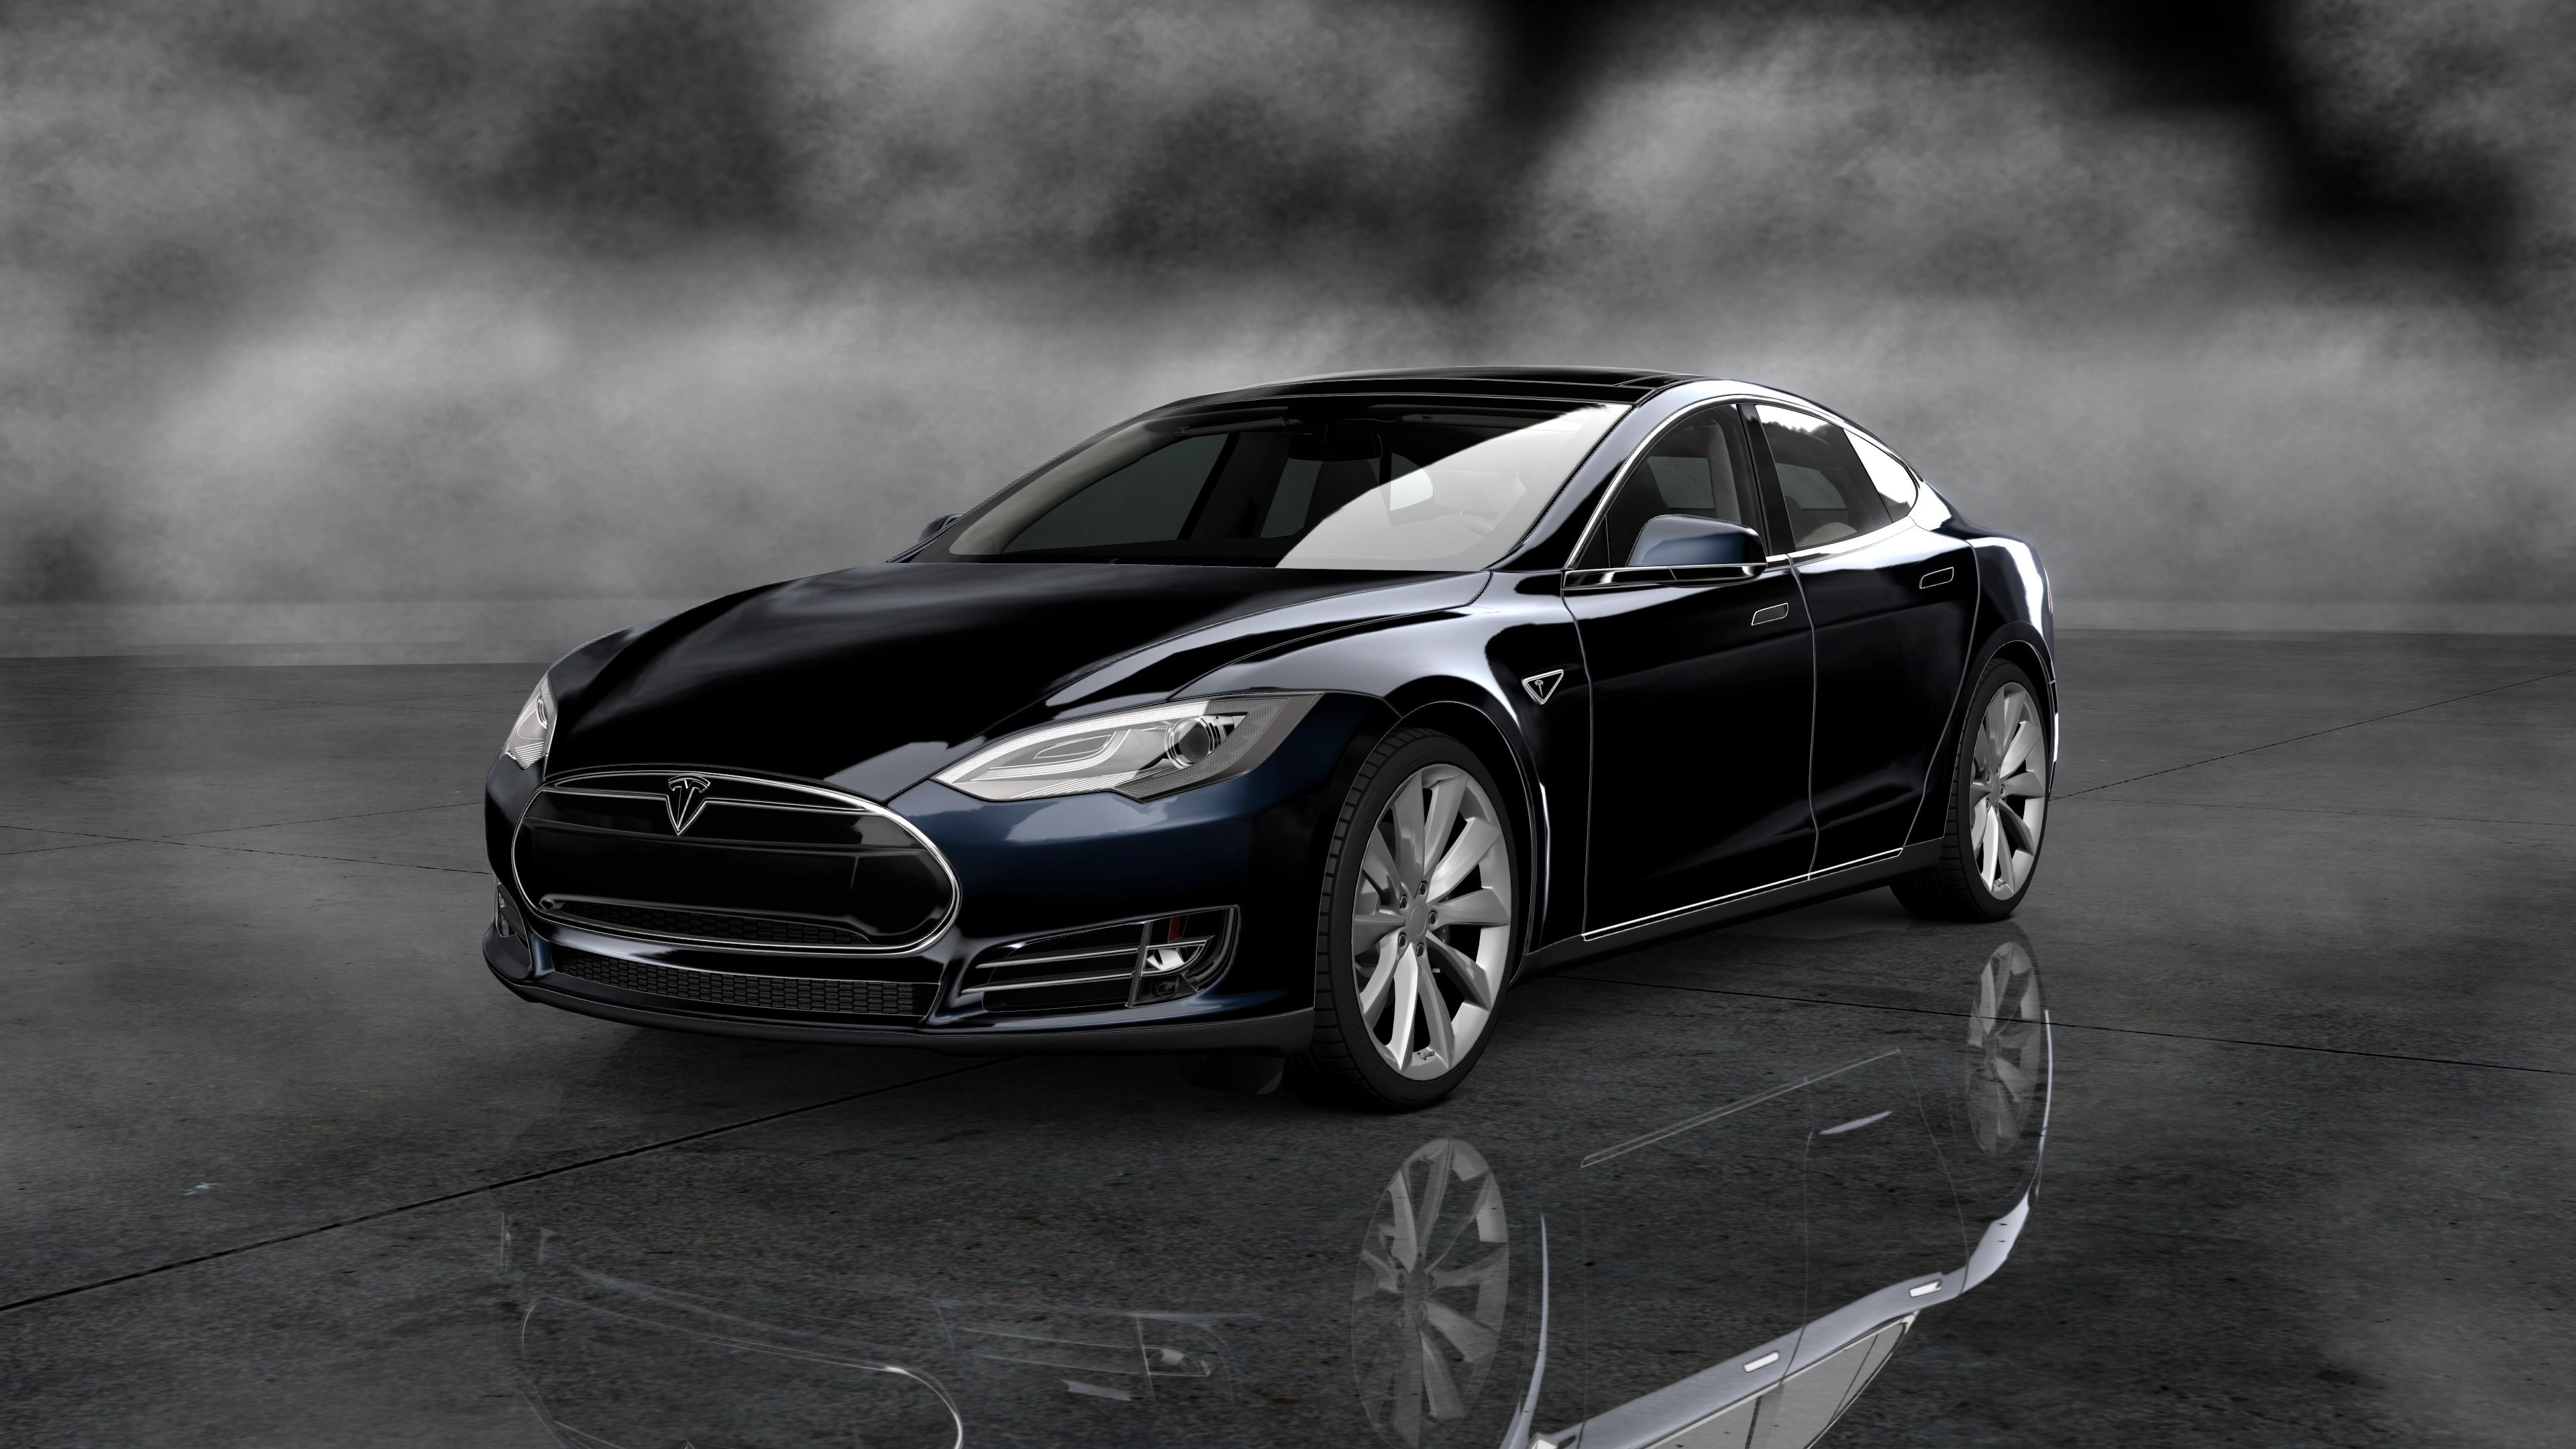 Tesla HD Wallpapers Hd Wallpapers 3840x2160